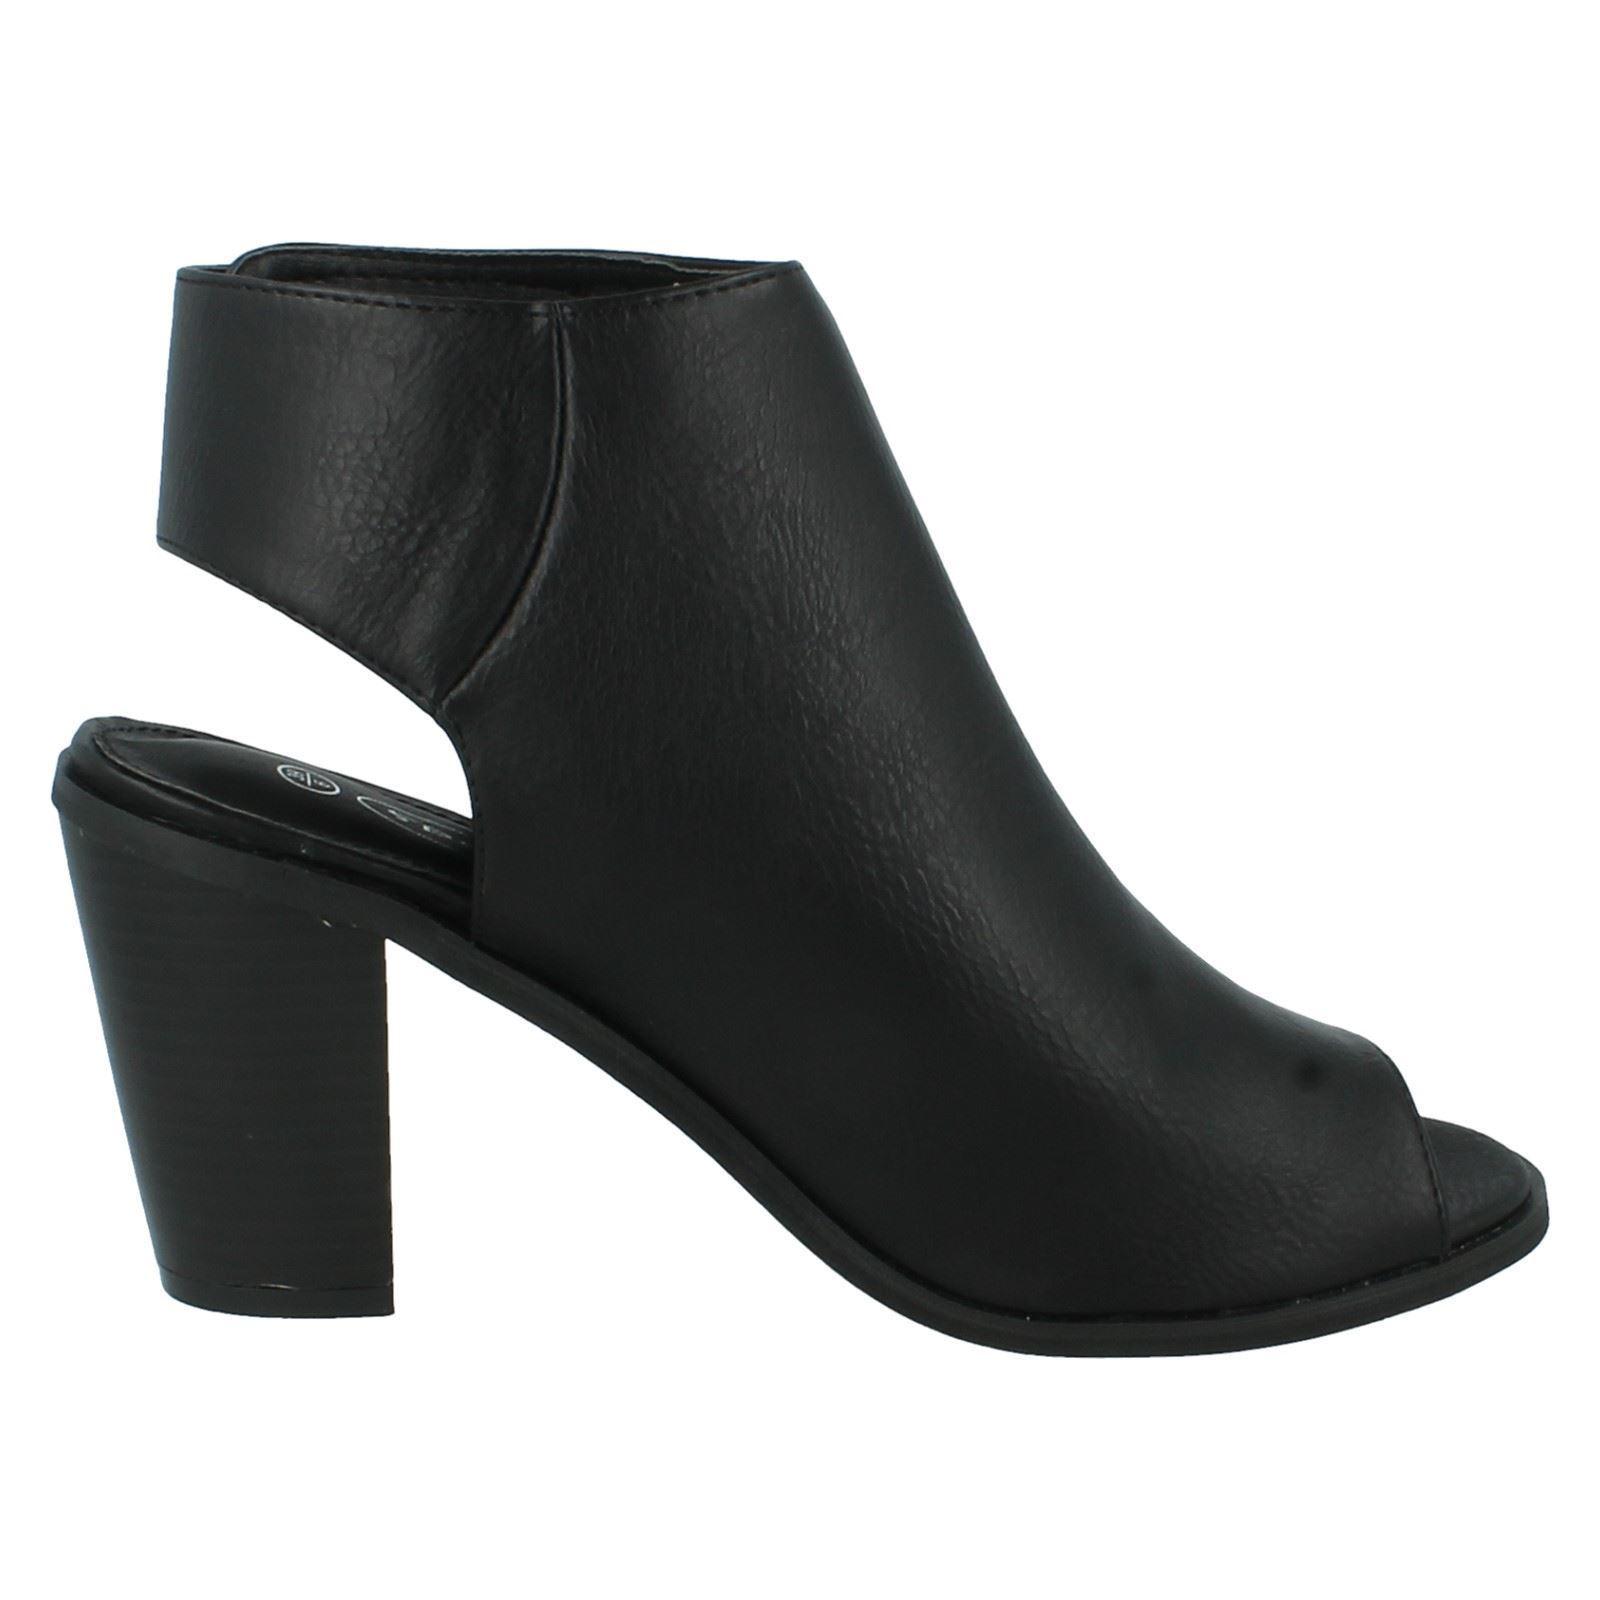 Spot on Bout Ouvert Chaussure Femmes Bottes